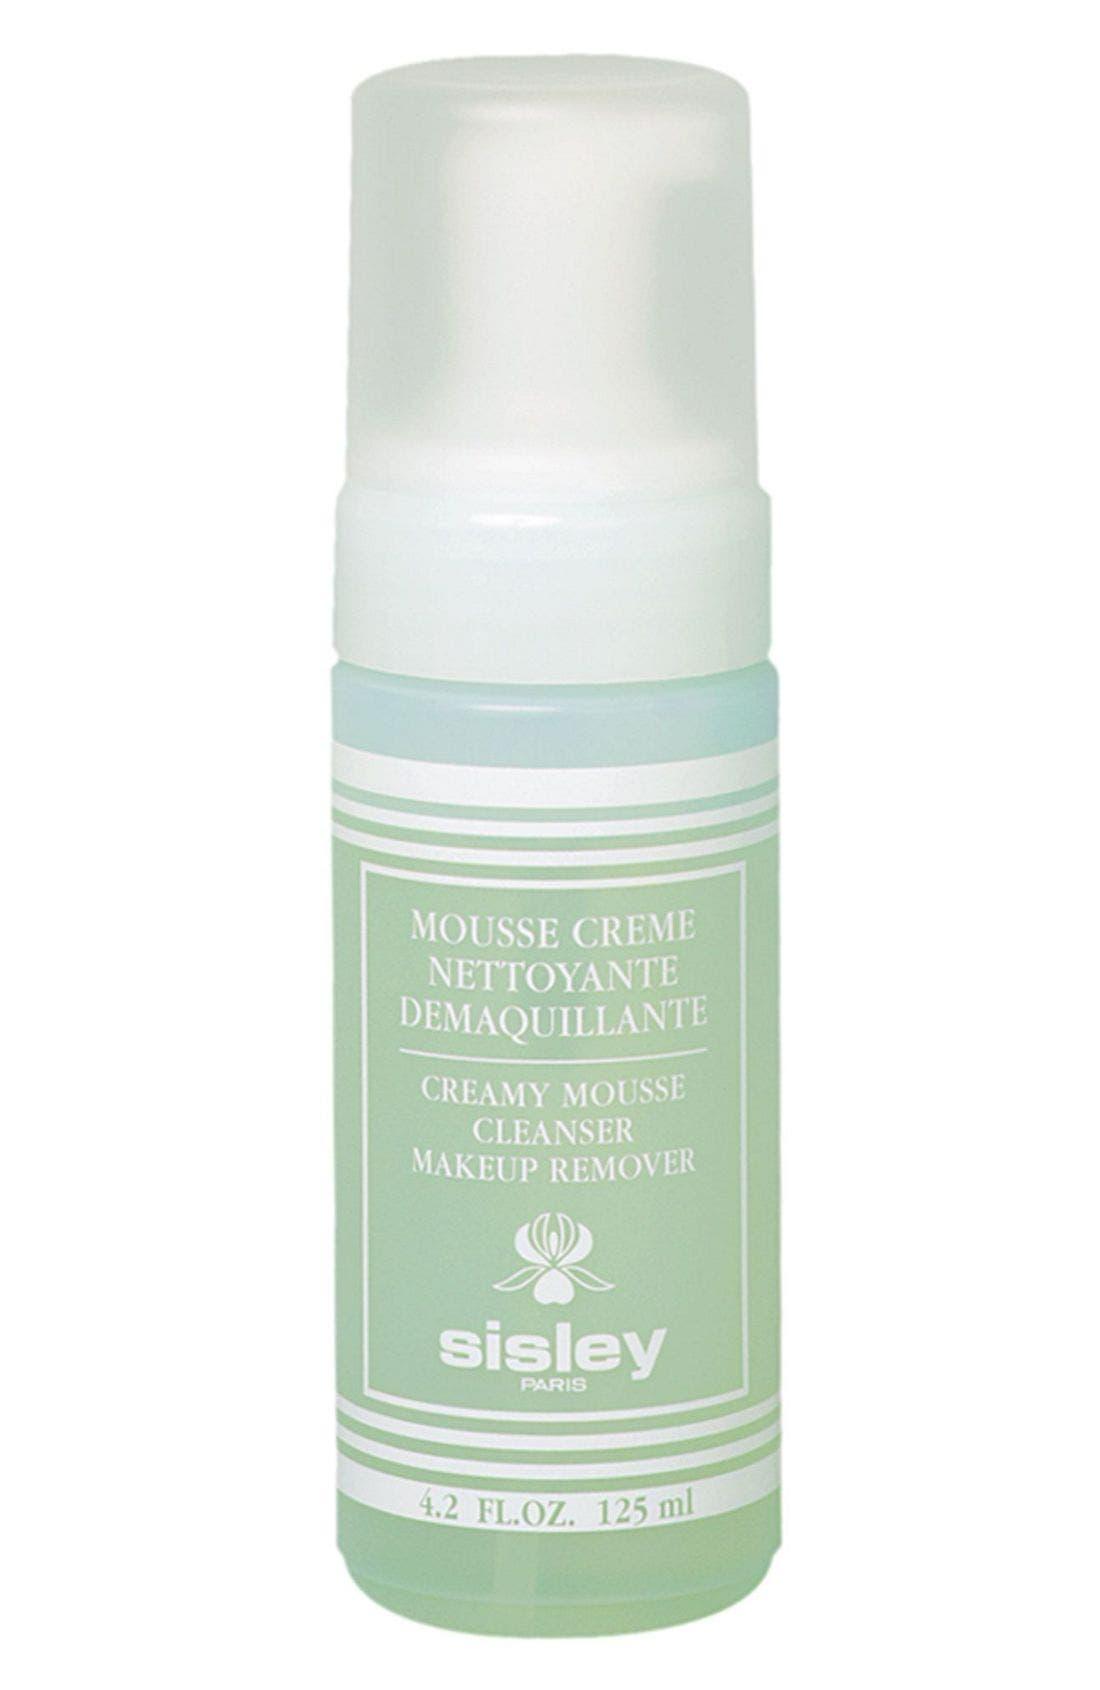 Sisley Paris Creamy Mousse Cleanser Makeup Remover